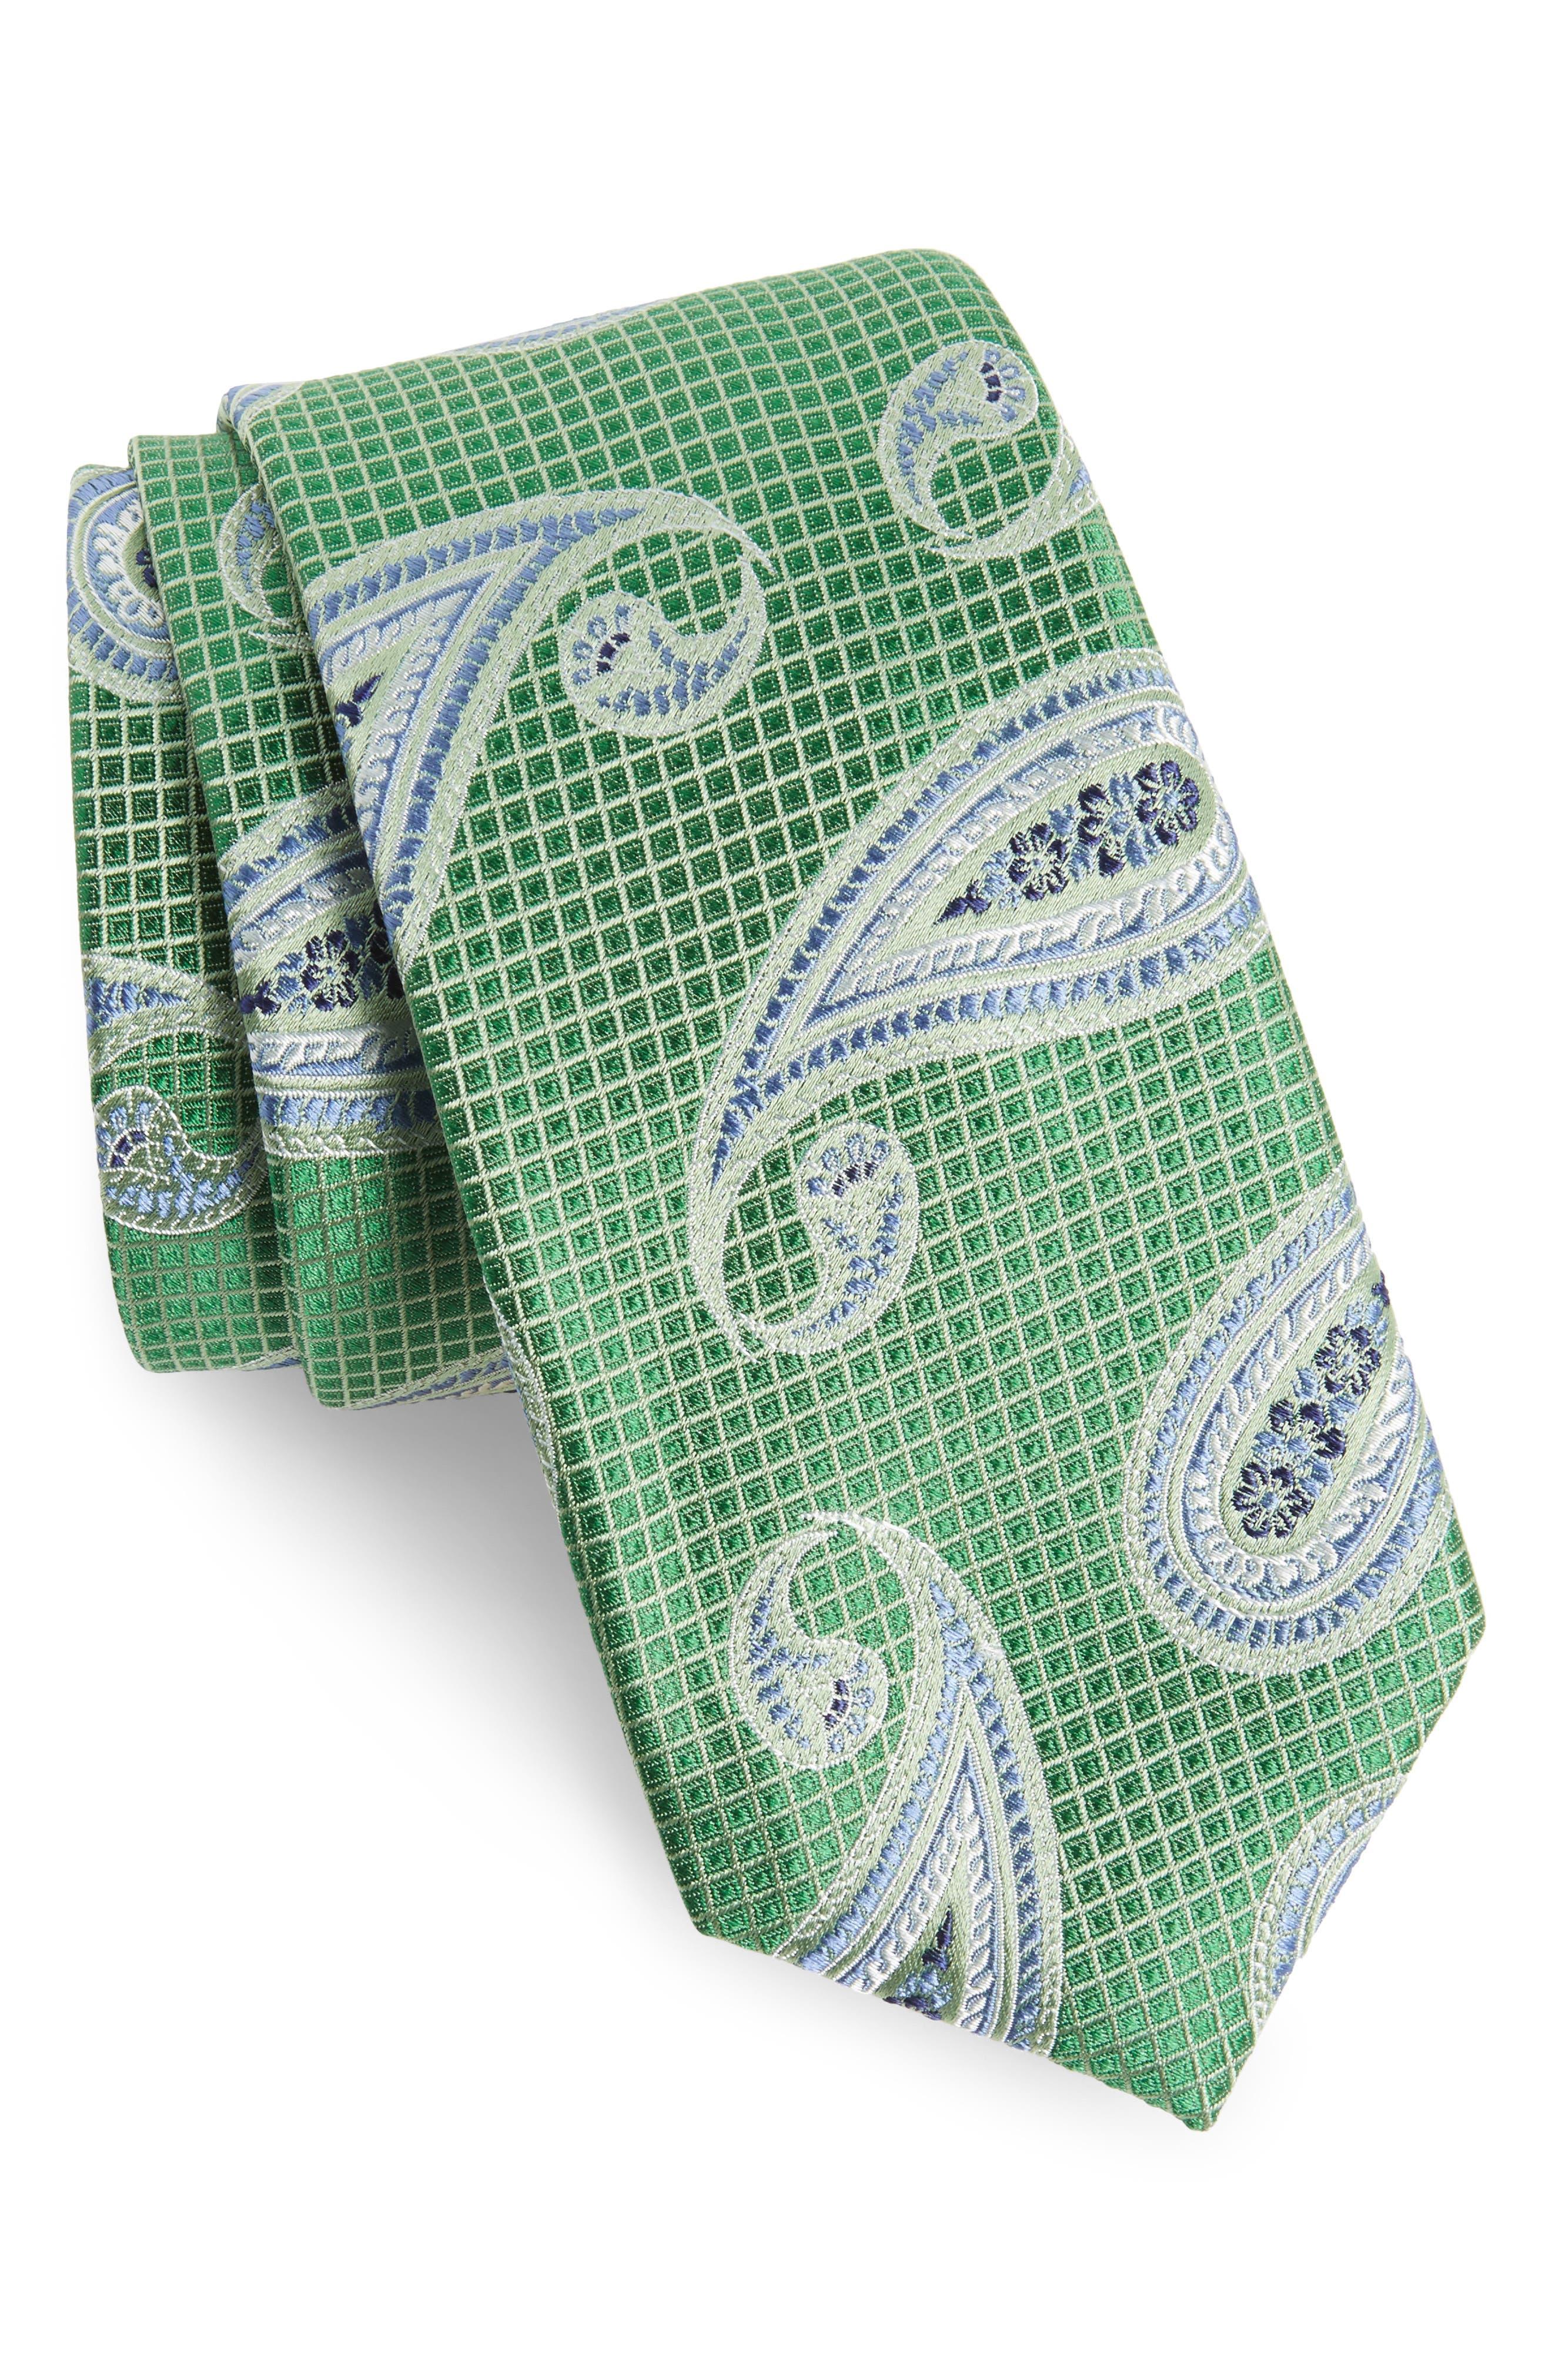 Alternate Image 1 Selected - Nordstrom Men's Shop Paisley Silk Tie